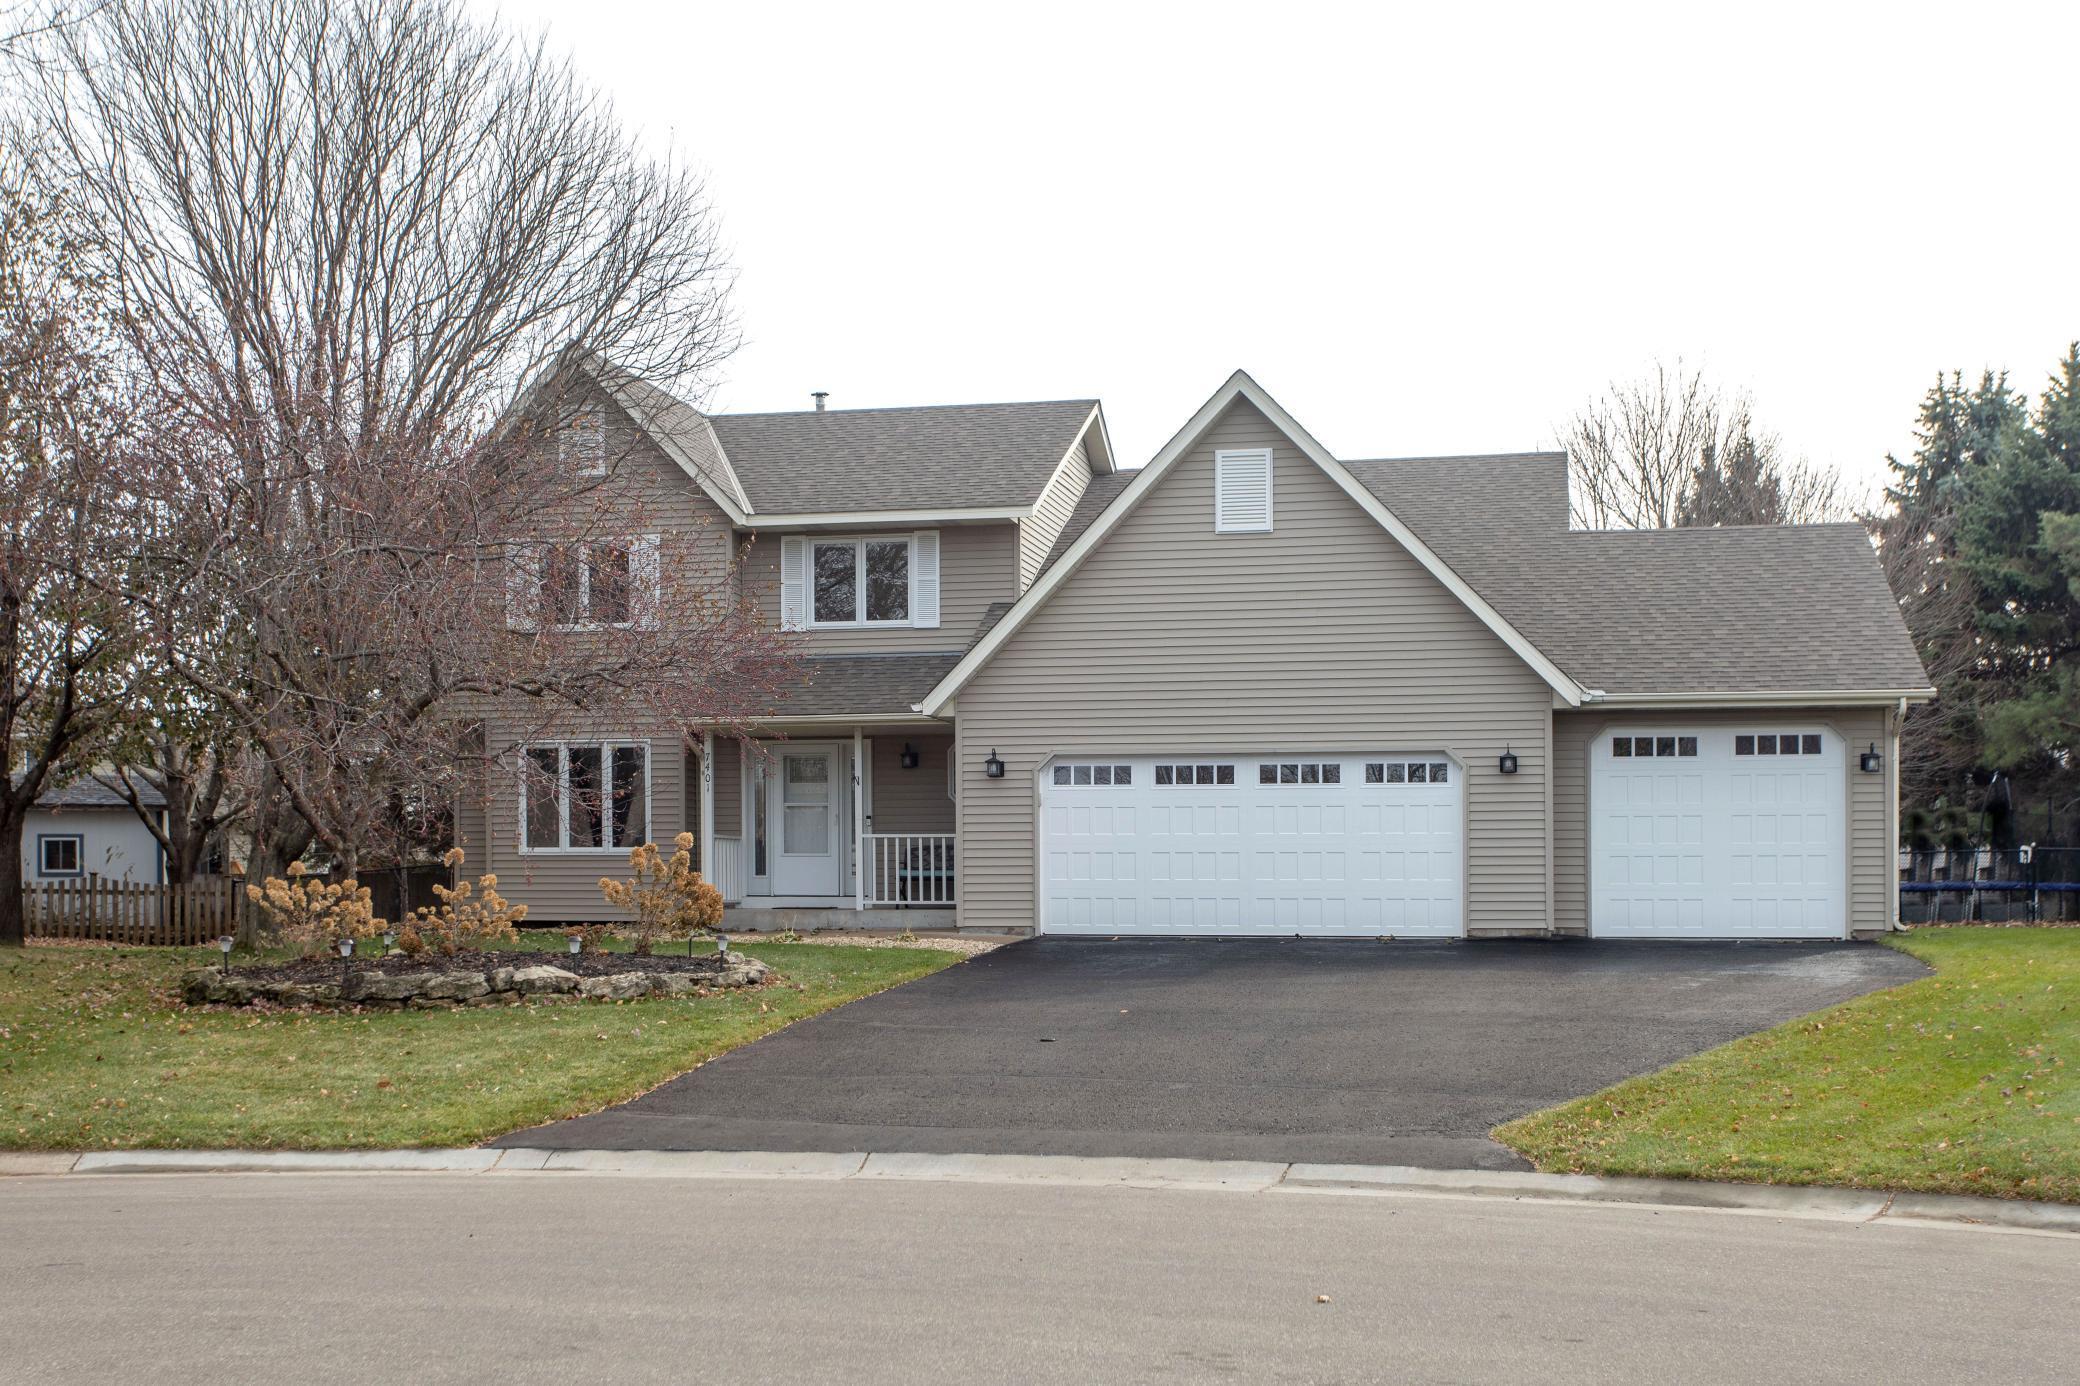 7401 Newbury Alcove Property Photo - Woodbury, MN real estate listing